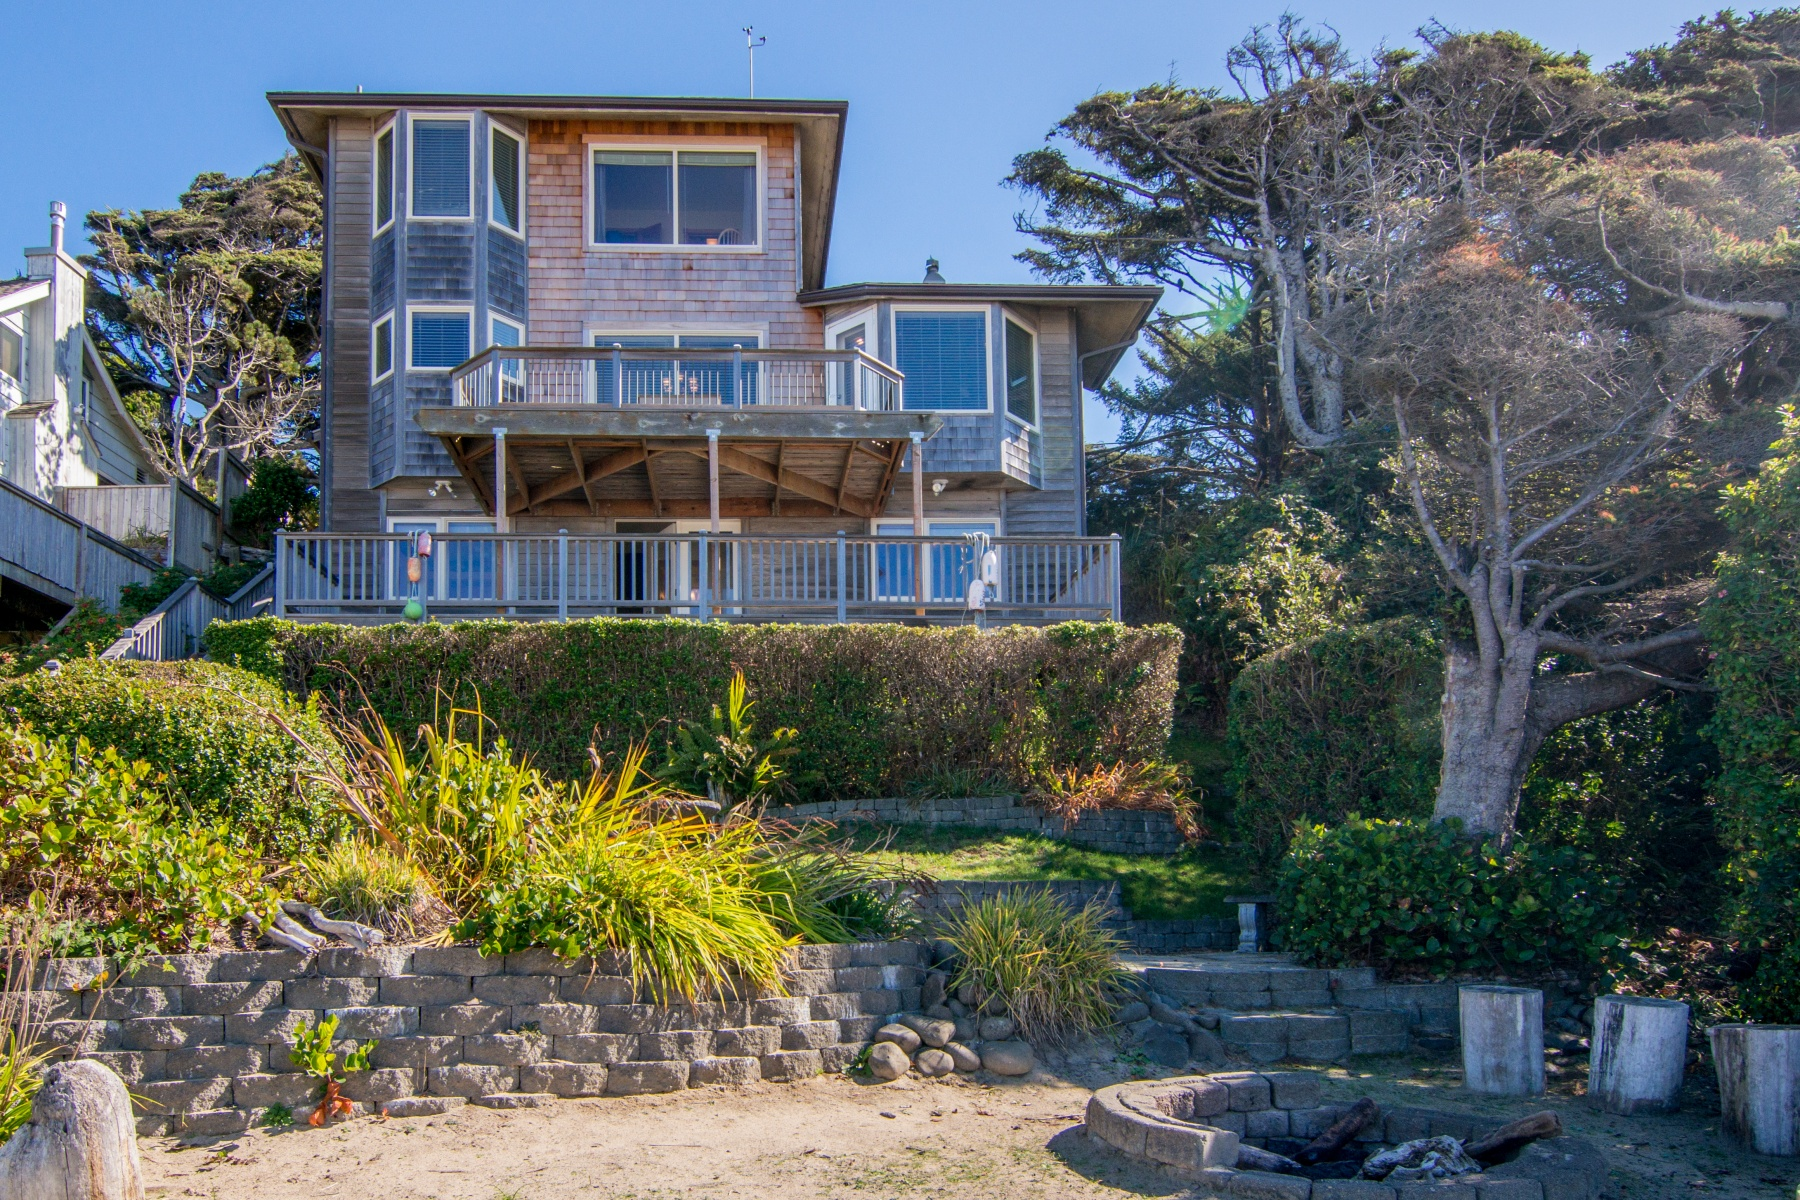 Nhà ở một gia đình vì Bán tại 4580 Logan LN, CANNON BEACH, OR Cannon Beach, Oregon 97110 Hoa Kỳ